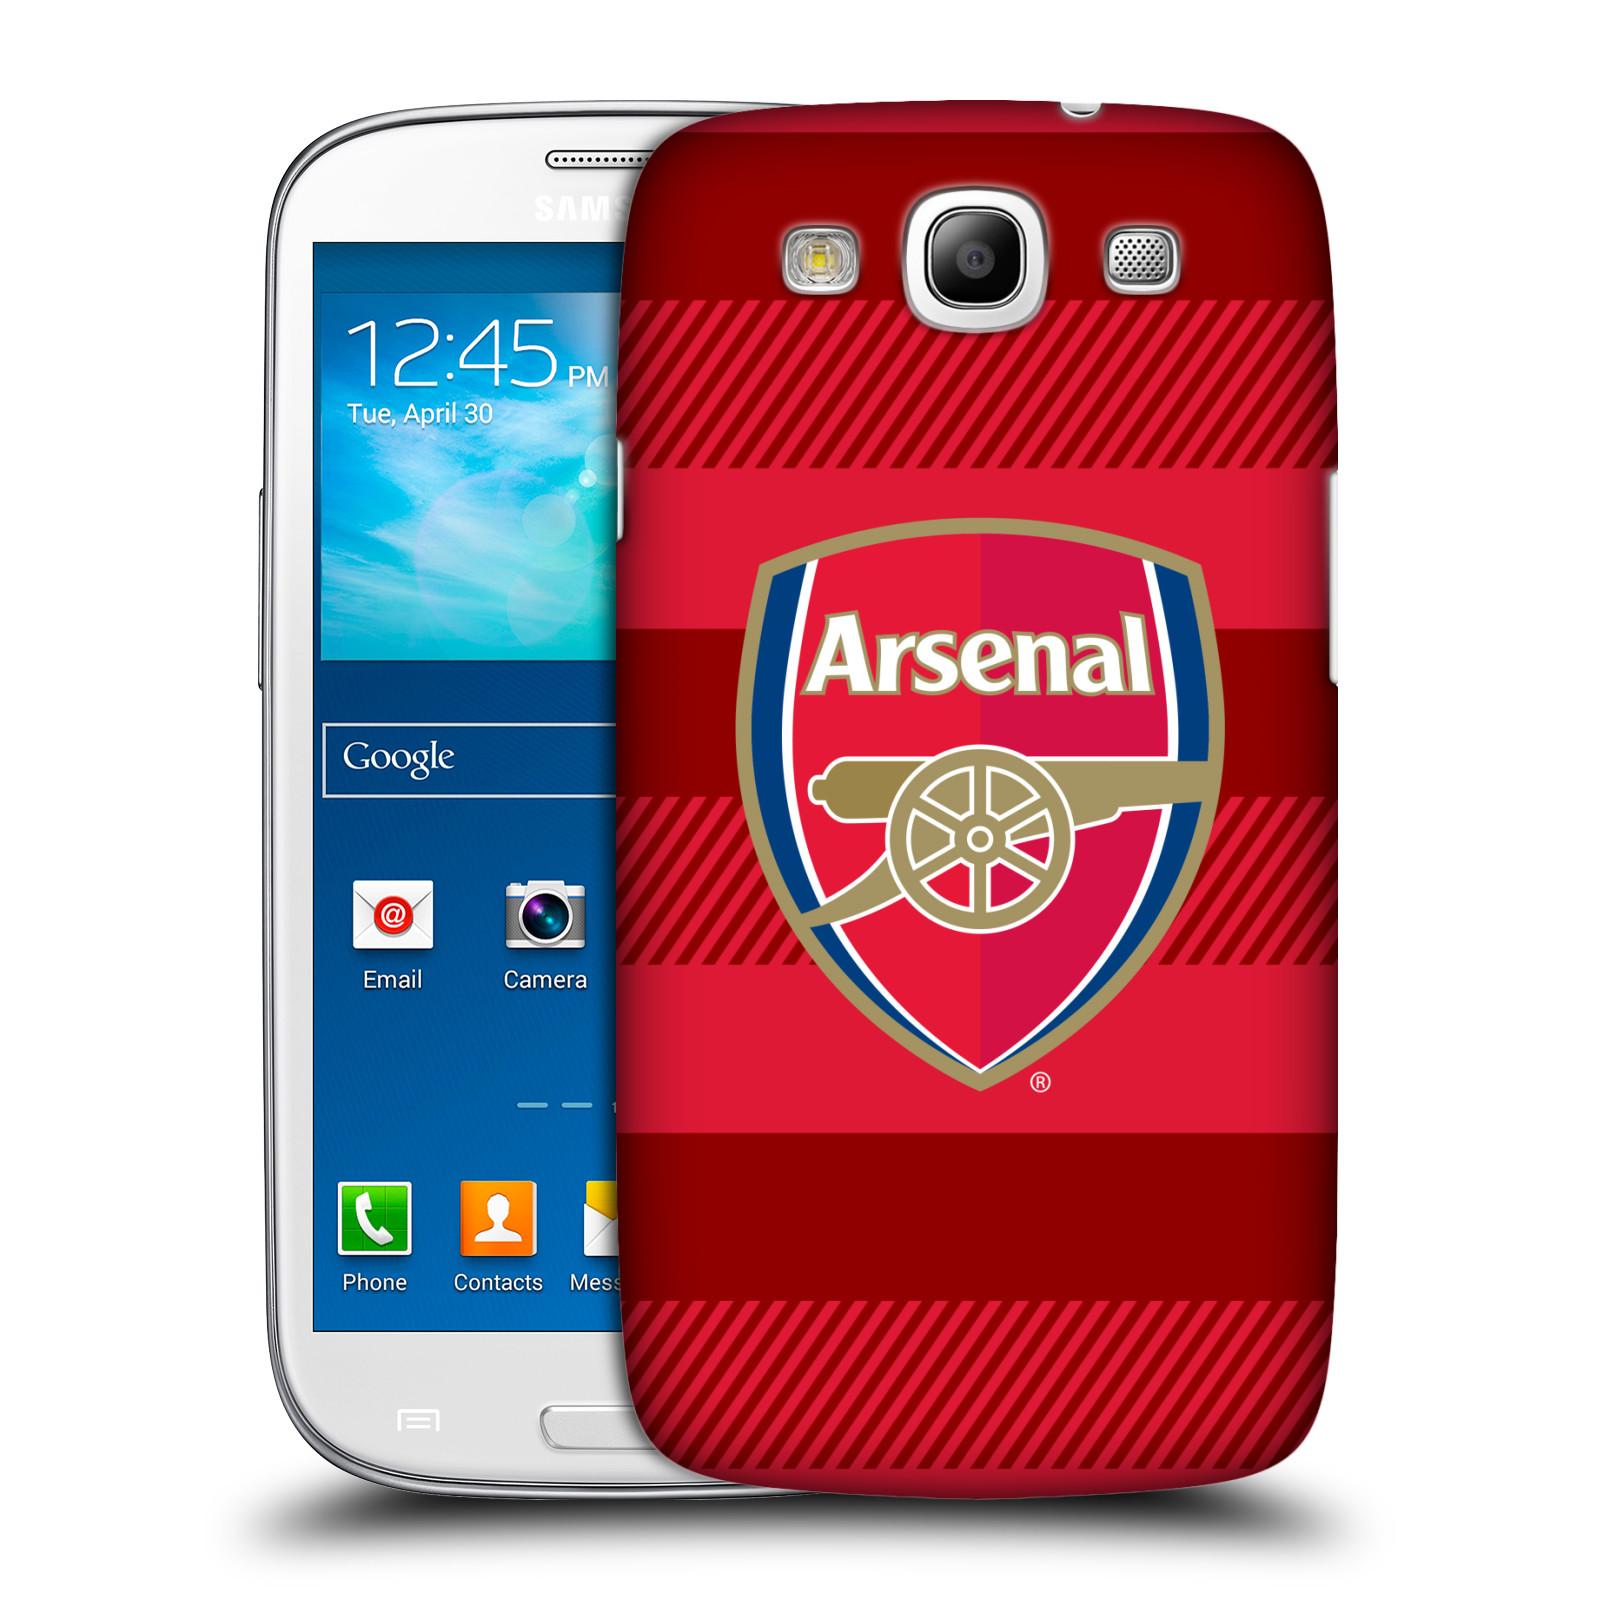 Plastové pouzdro na mobil Samsung Galaxy S III - Head Case - Arsenal FC - Logo s pruhy